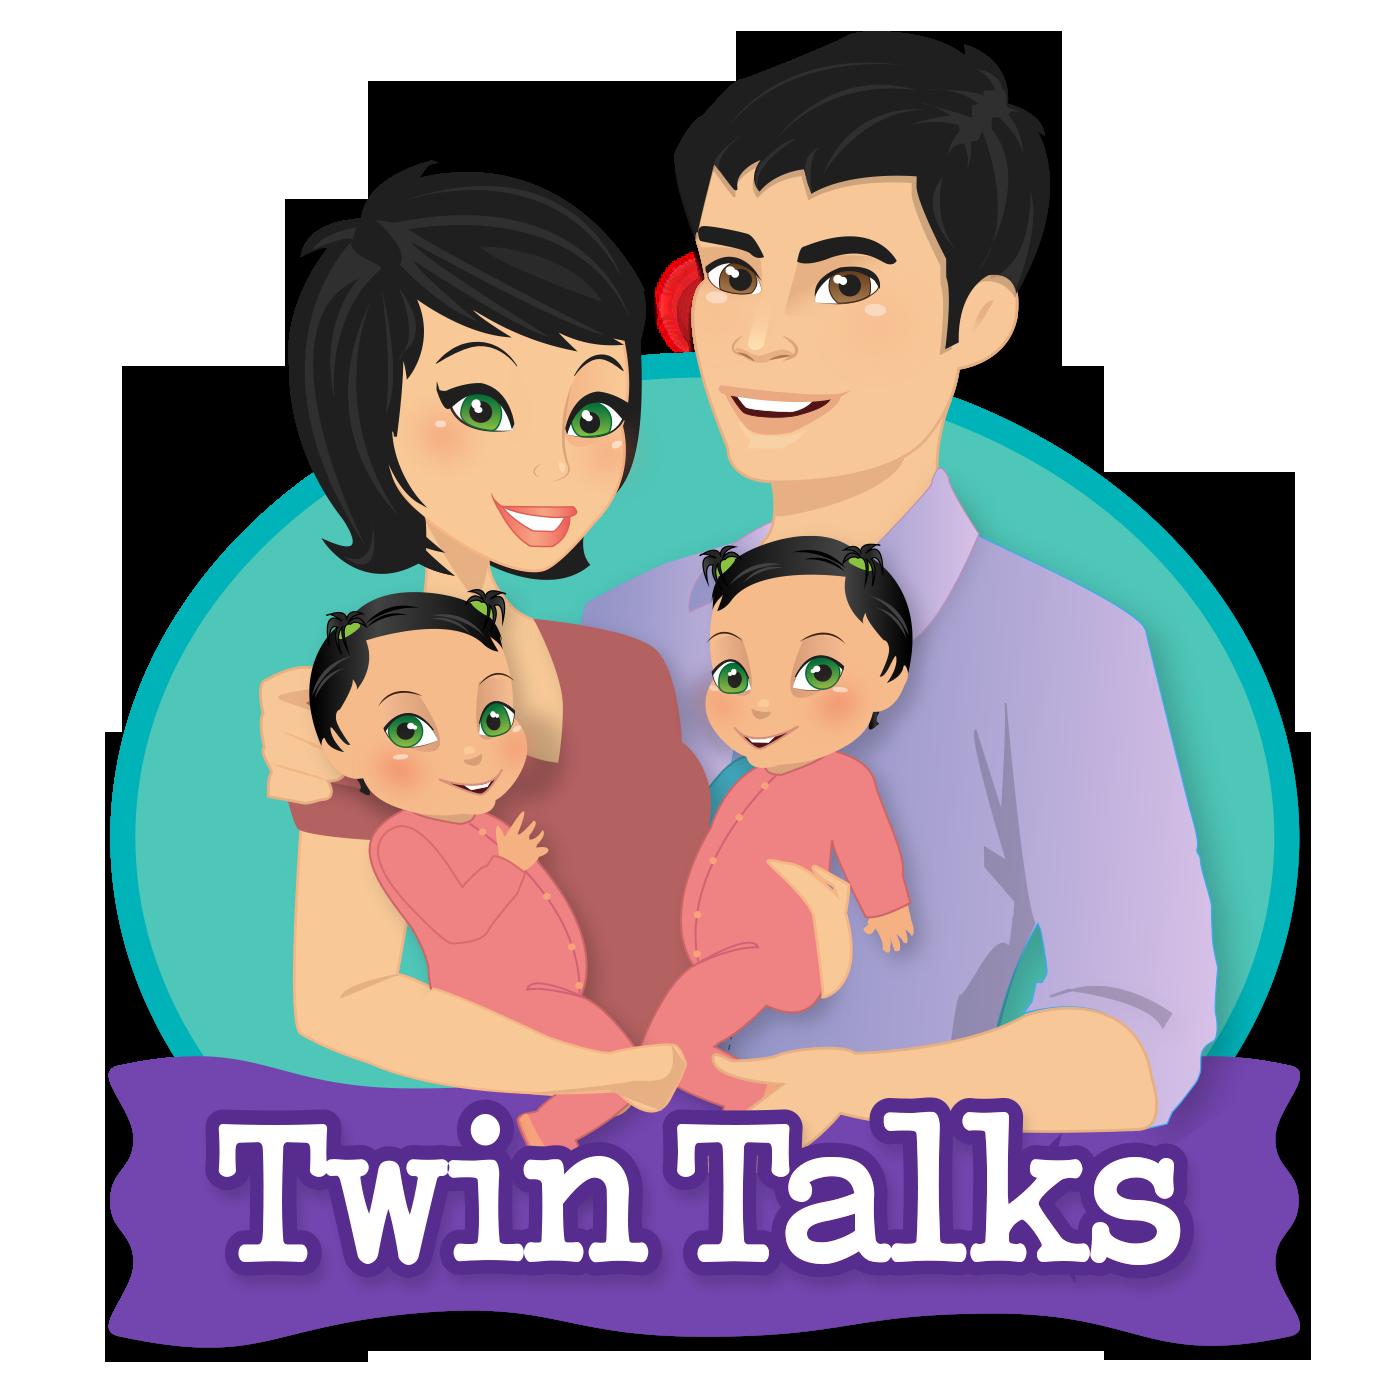 Twins identical